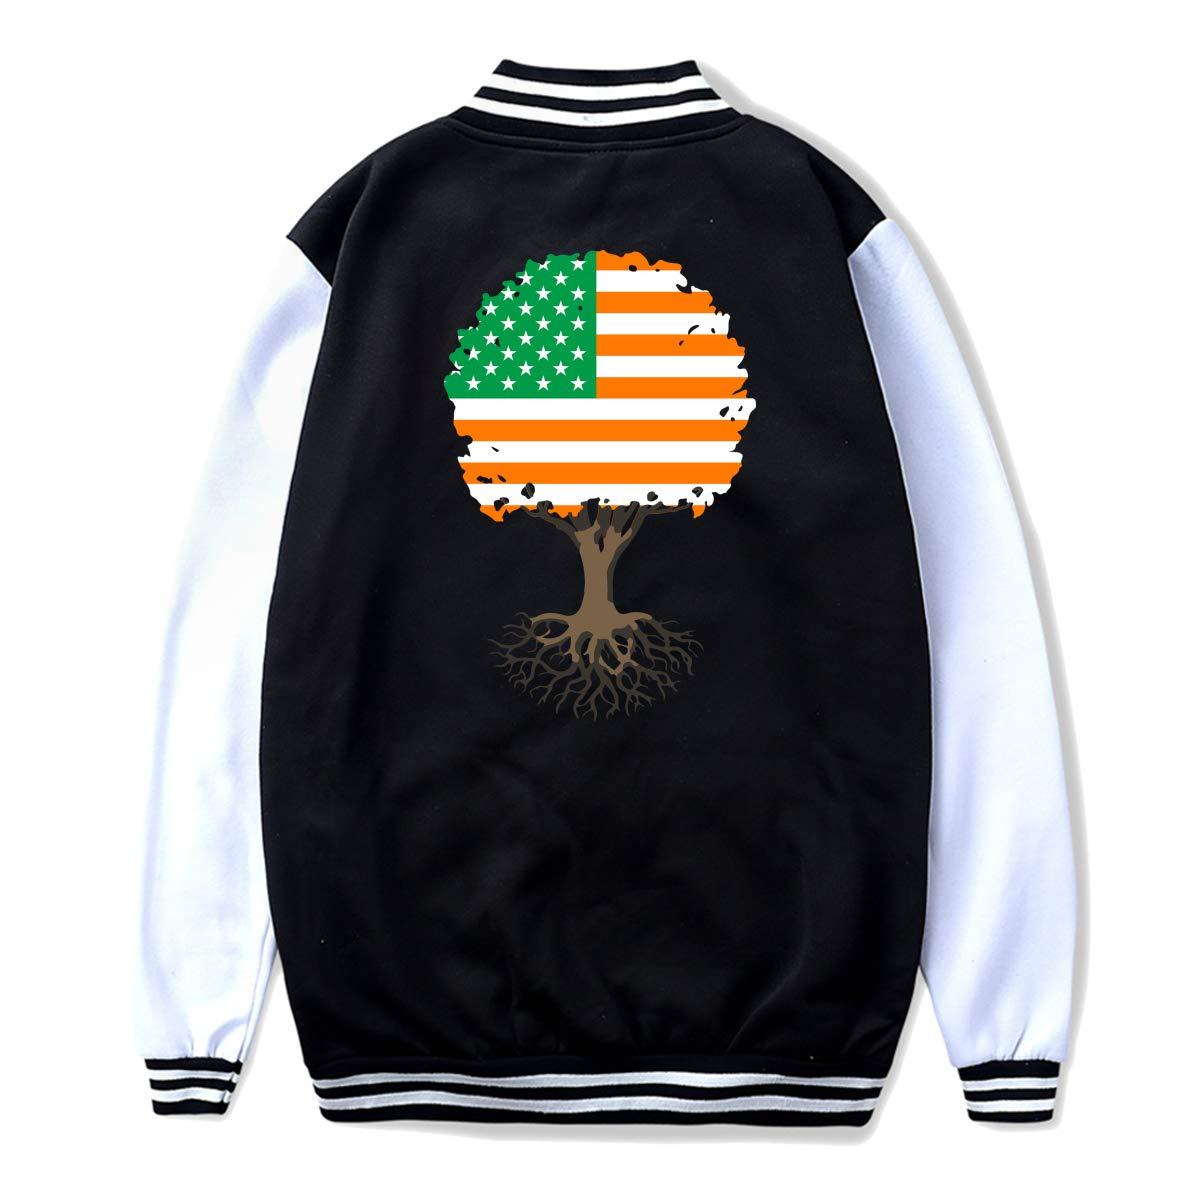 NJKM5MJ Unisex Youth Baseball Uniform Jacket Tree of Life with Irish Flag Hoodie Sweatshirt Sweater Tee Back Print